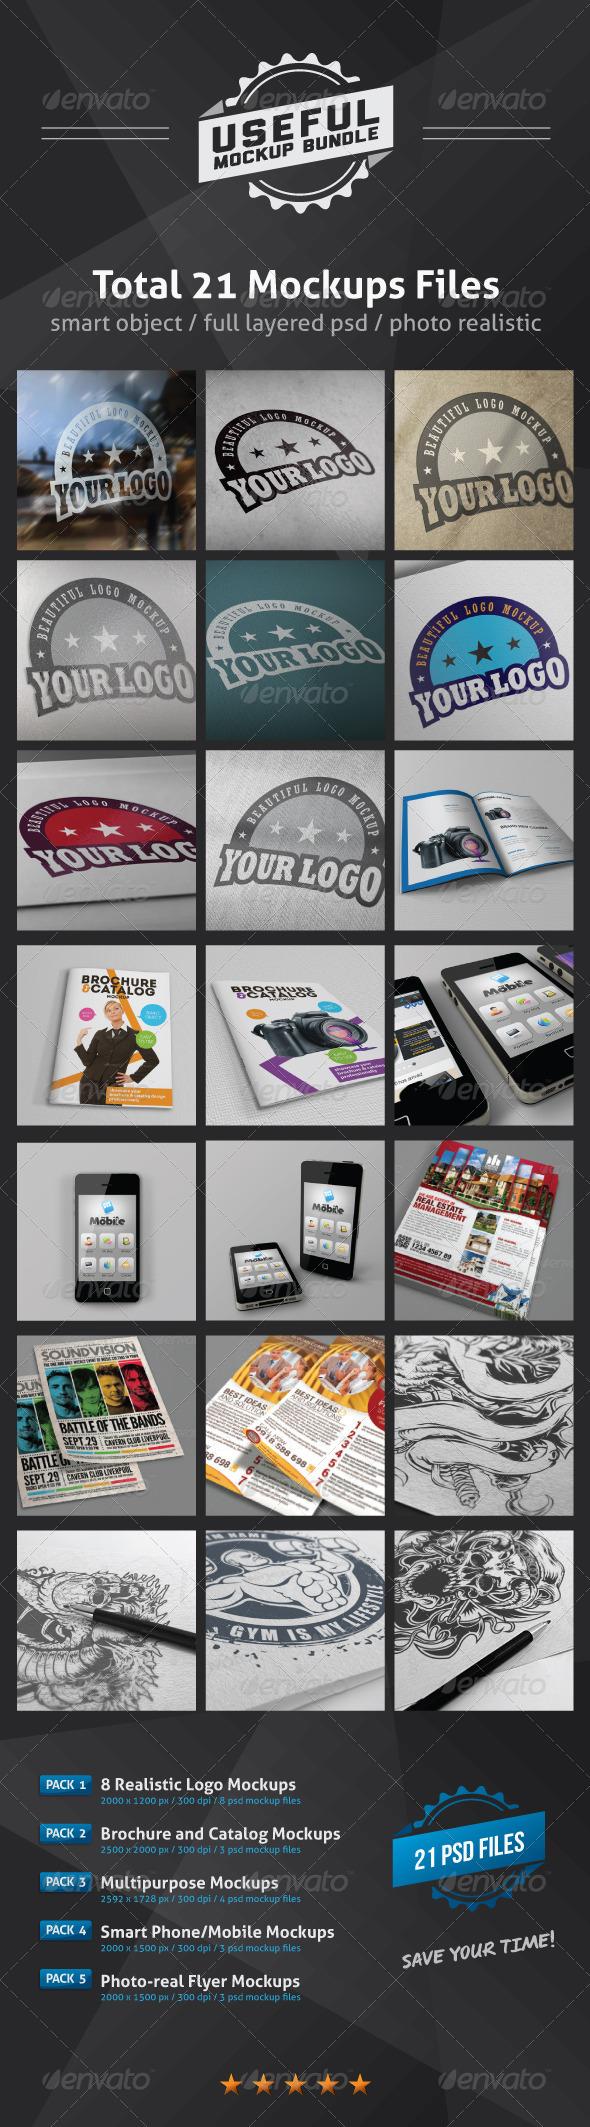 GraphicRiver Useful Mockups Bundle 2864081